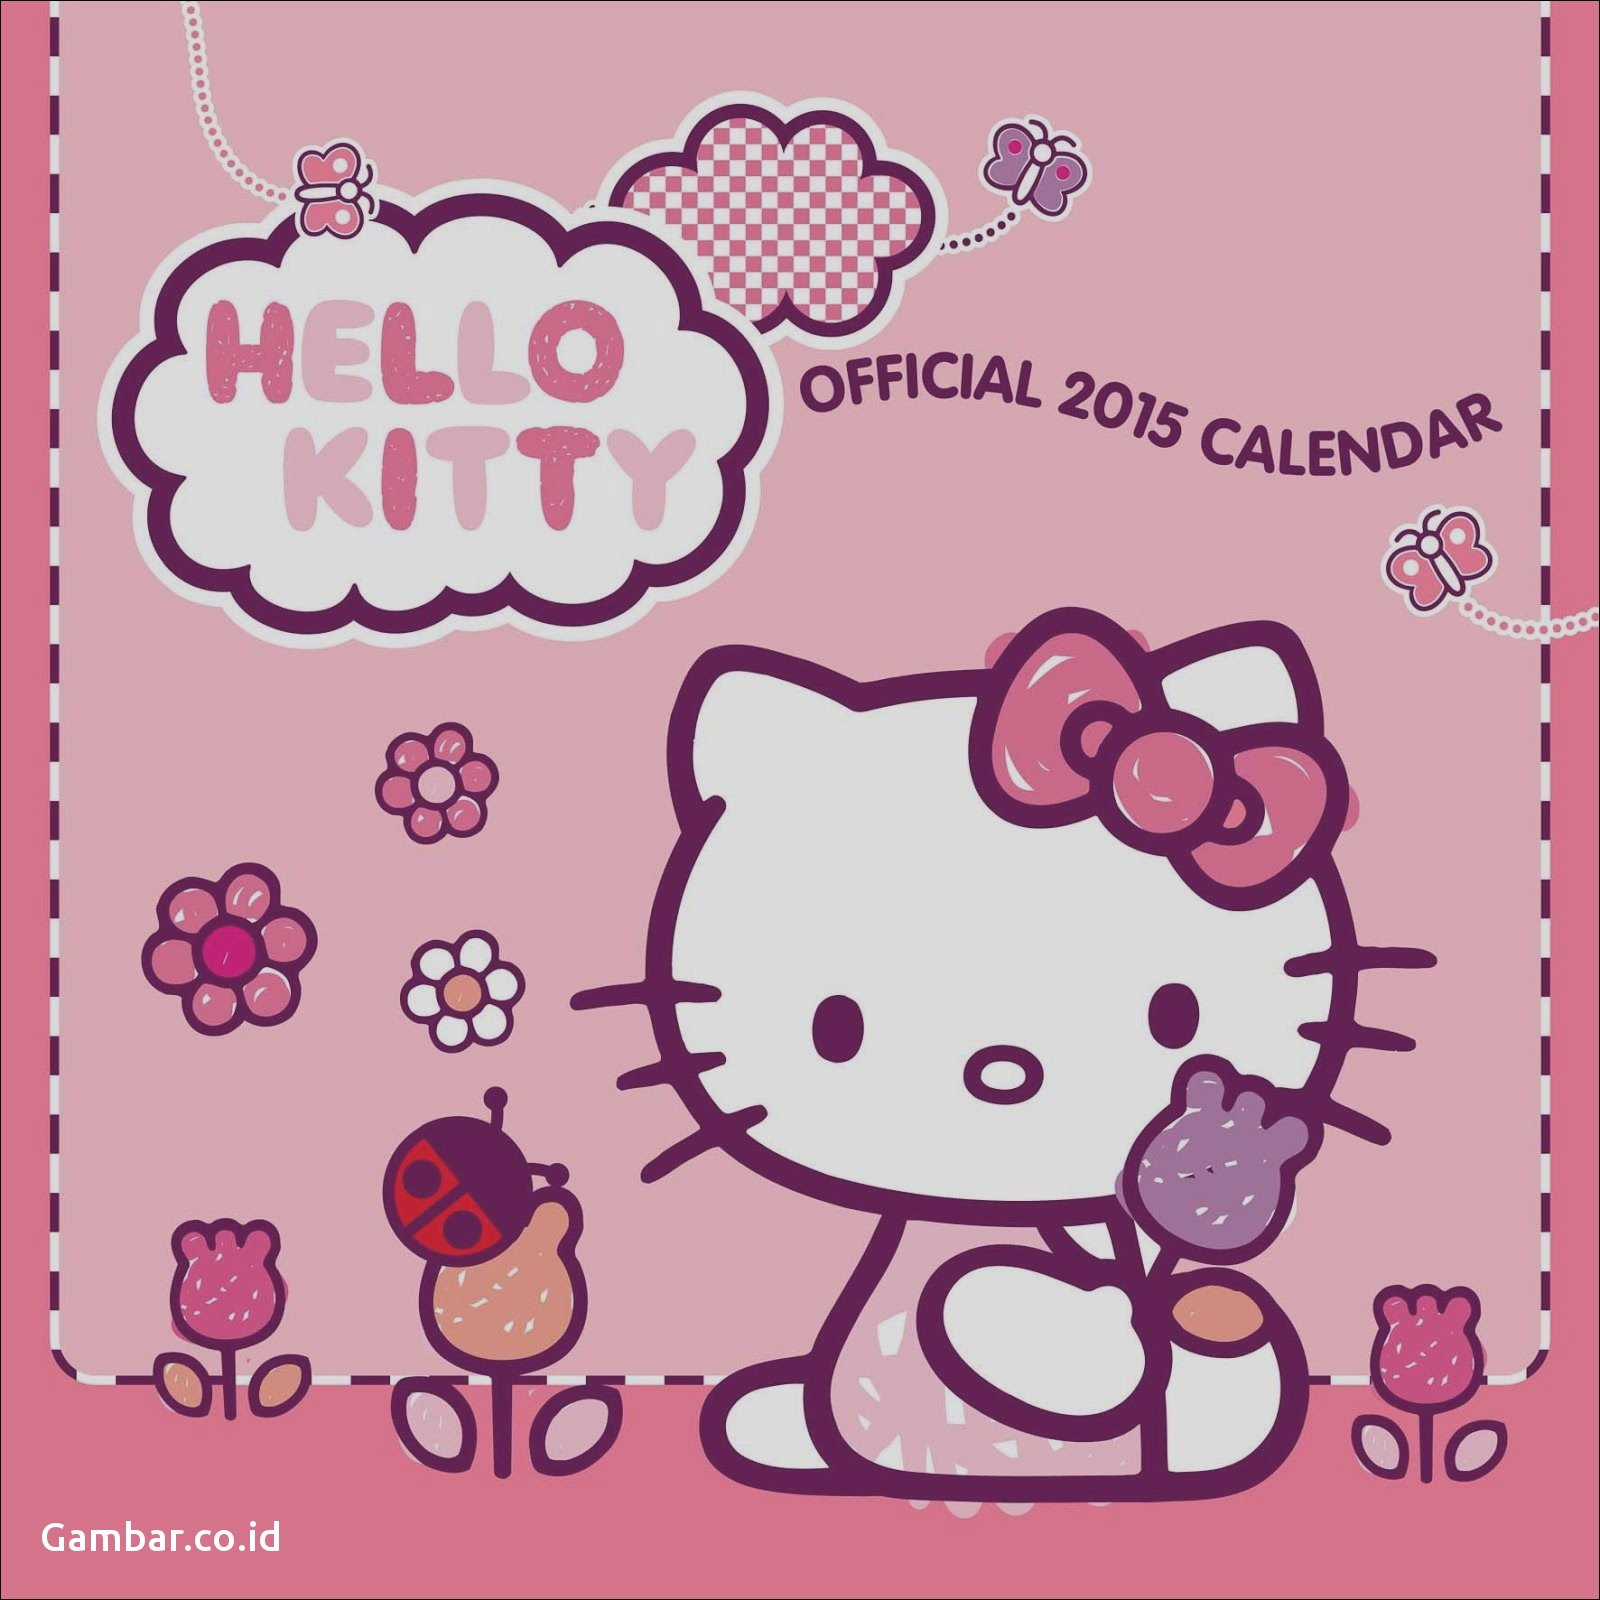 Wallpaper Lucu Iphone Redmi 6a Case Hello Kitty Hd